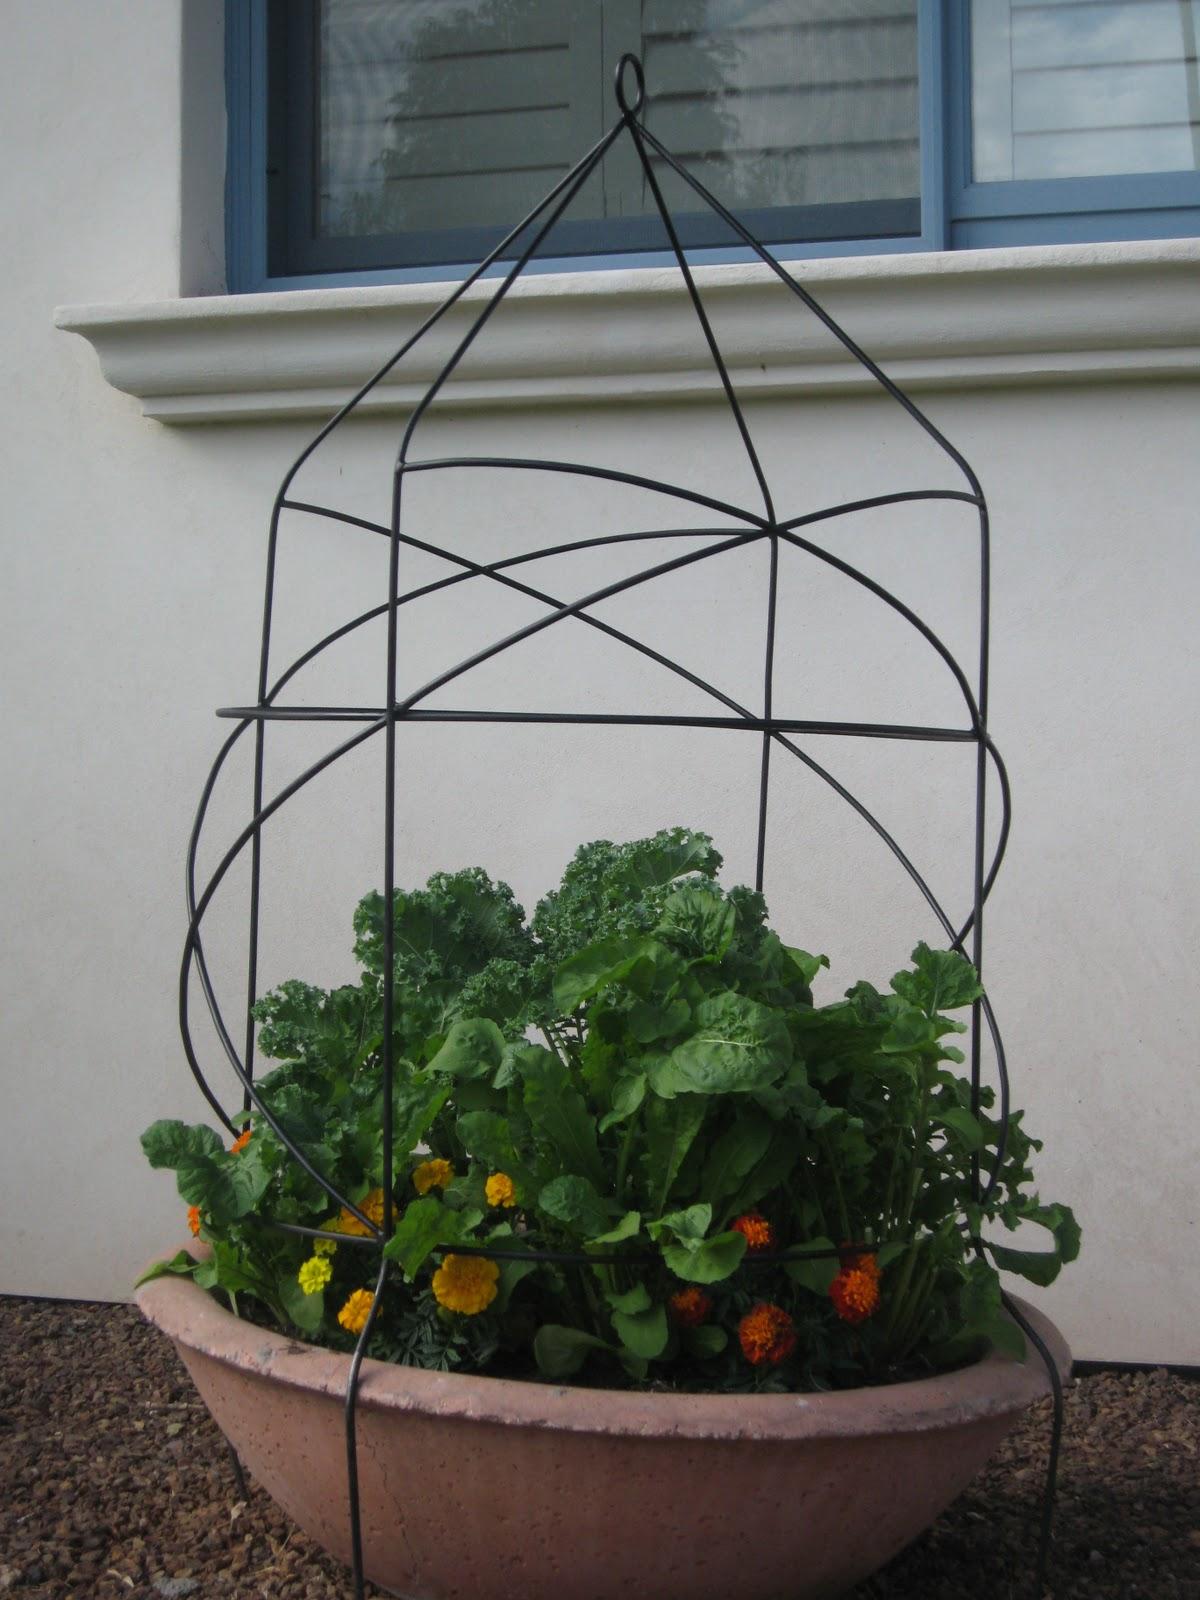 Sweet Life Garden Gardening Up In A Wine Barrel